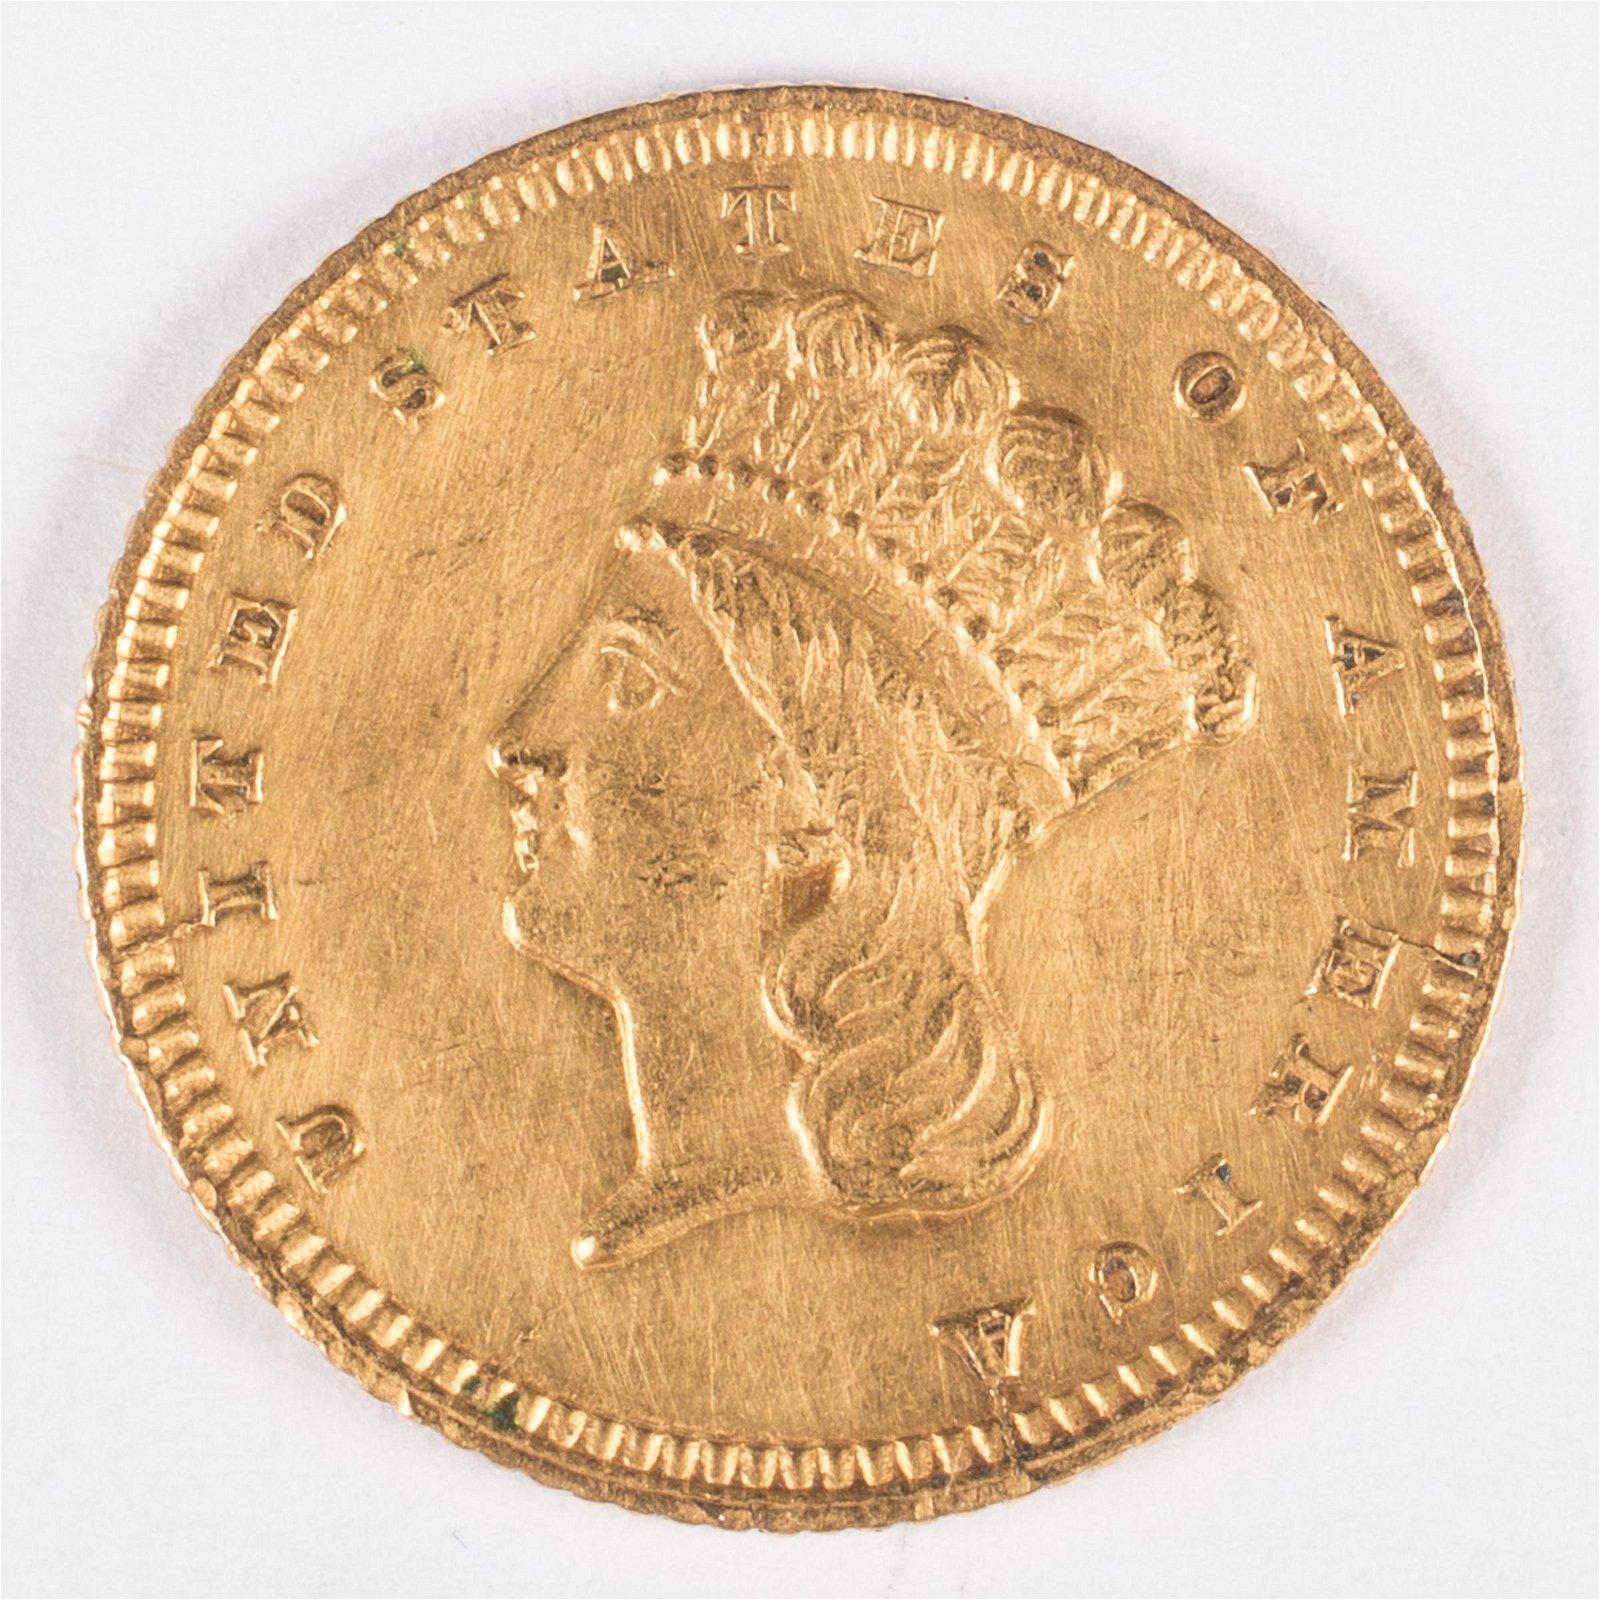 1861 (?) $1 GOLD COIN